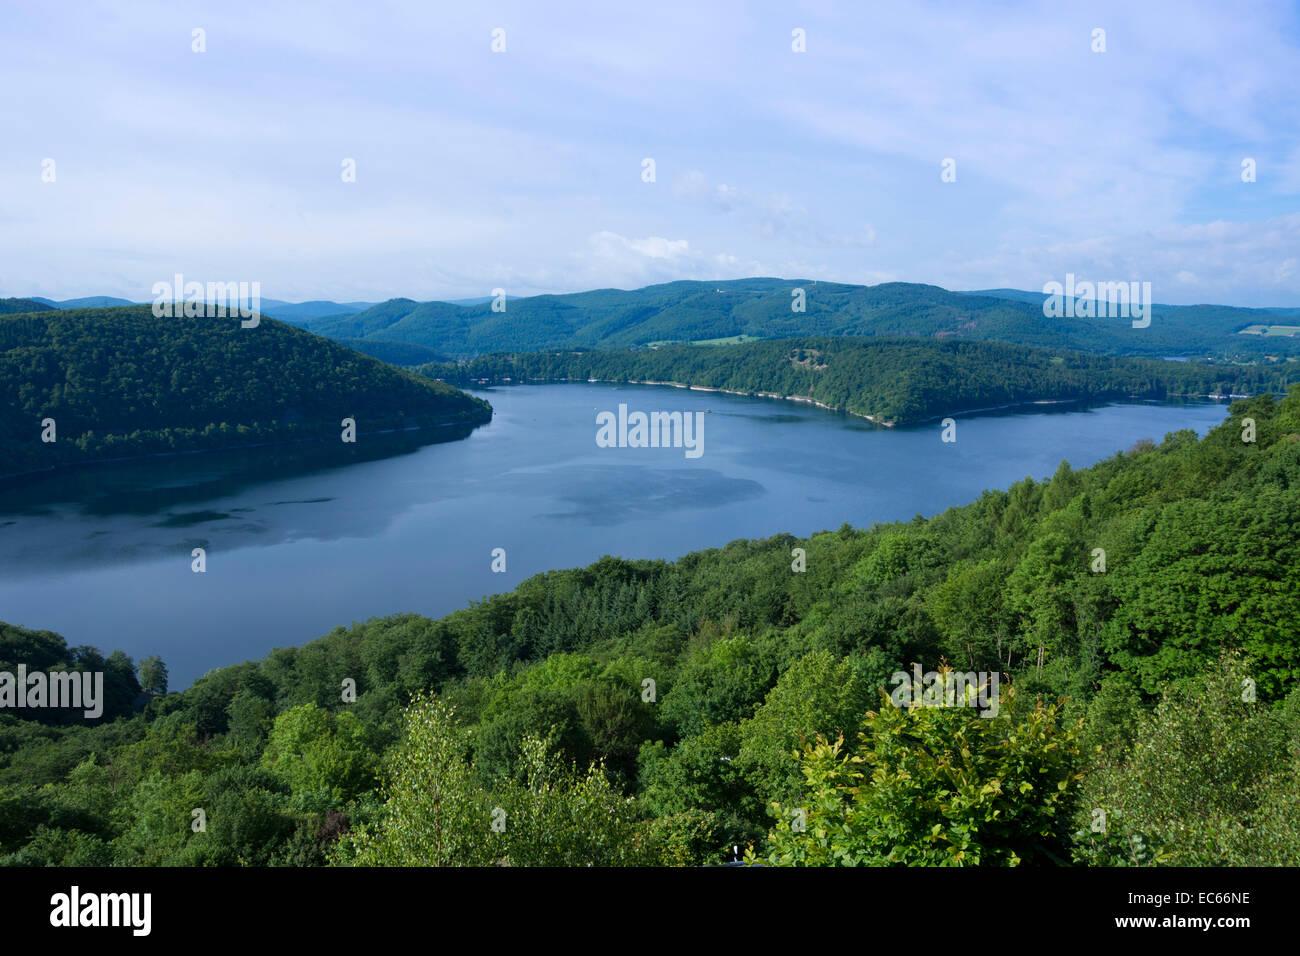 Edeersee lake, dam, Northern Hesse, Germany, Europe Stock Photo